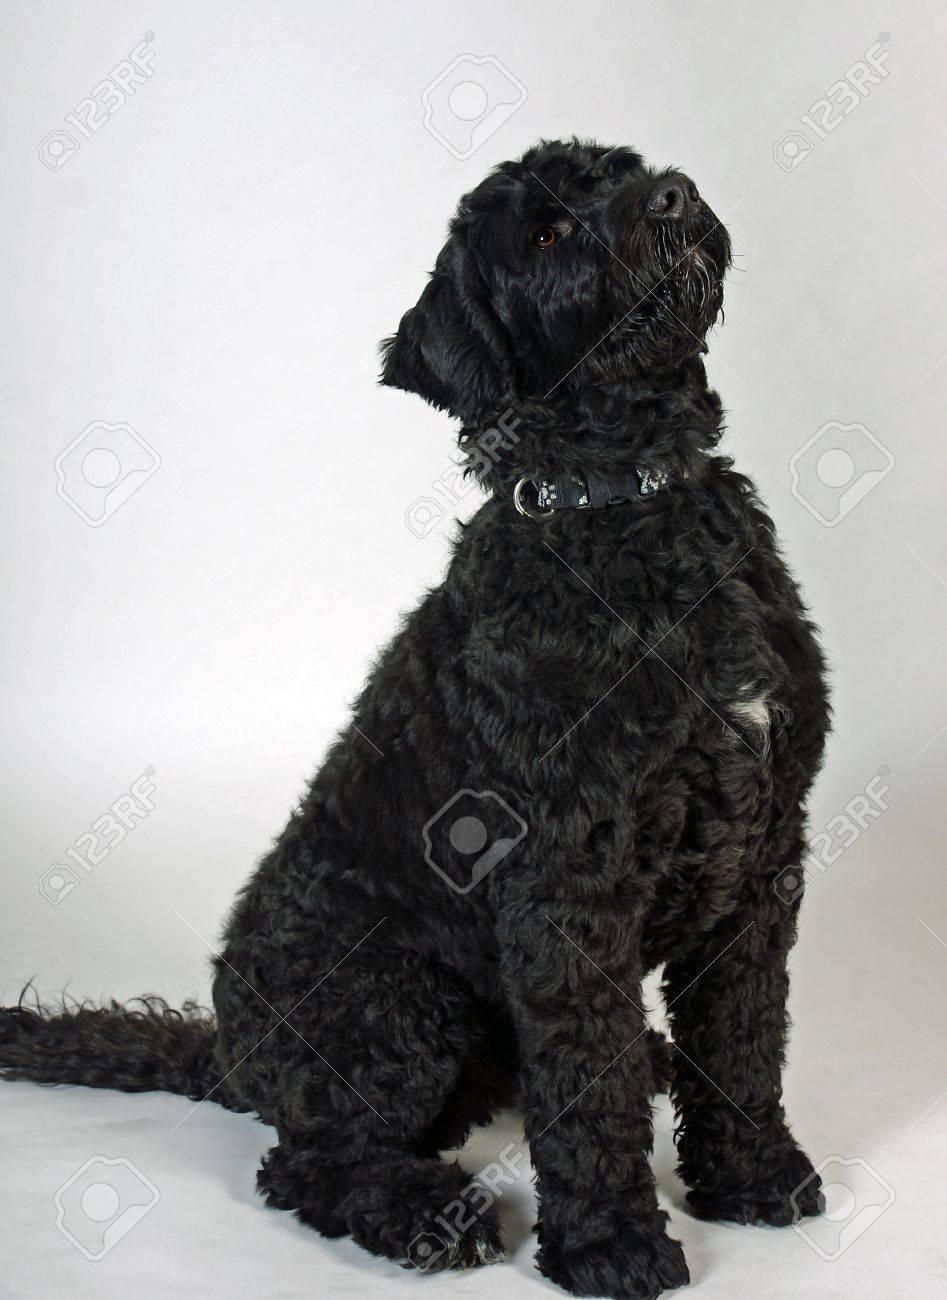 Black wavy-coated Portuguese Water Dog - 4702095